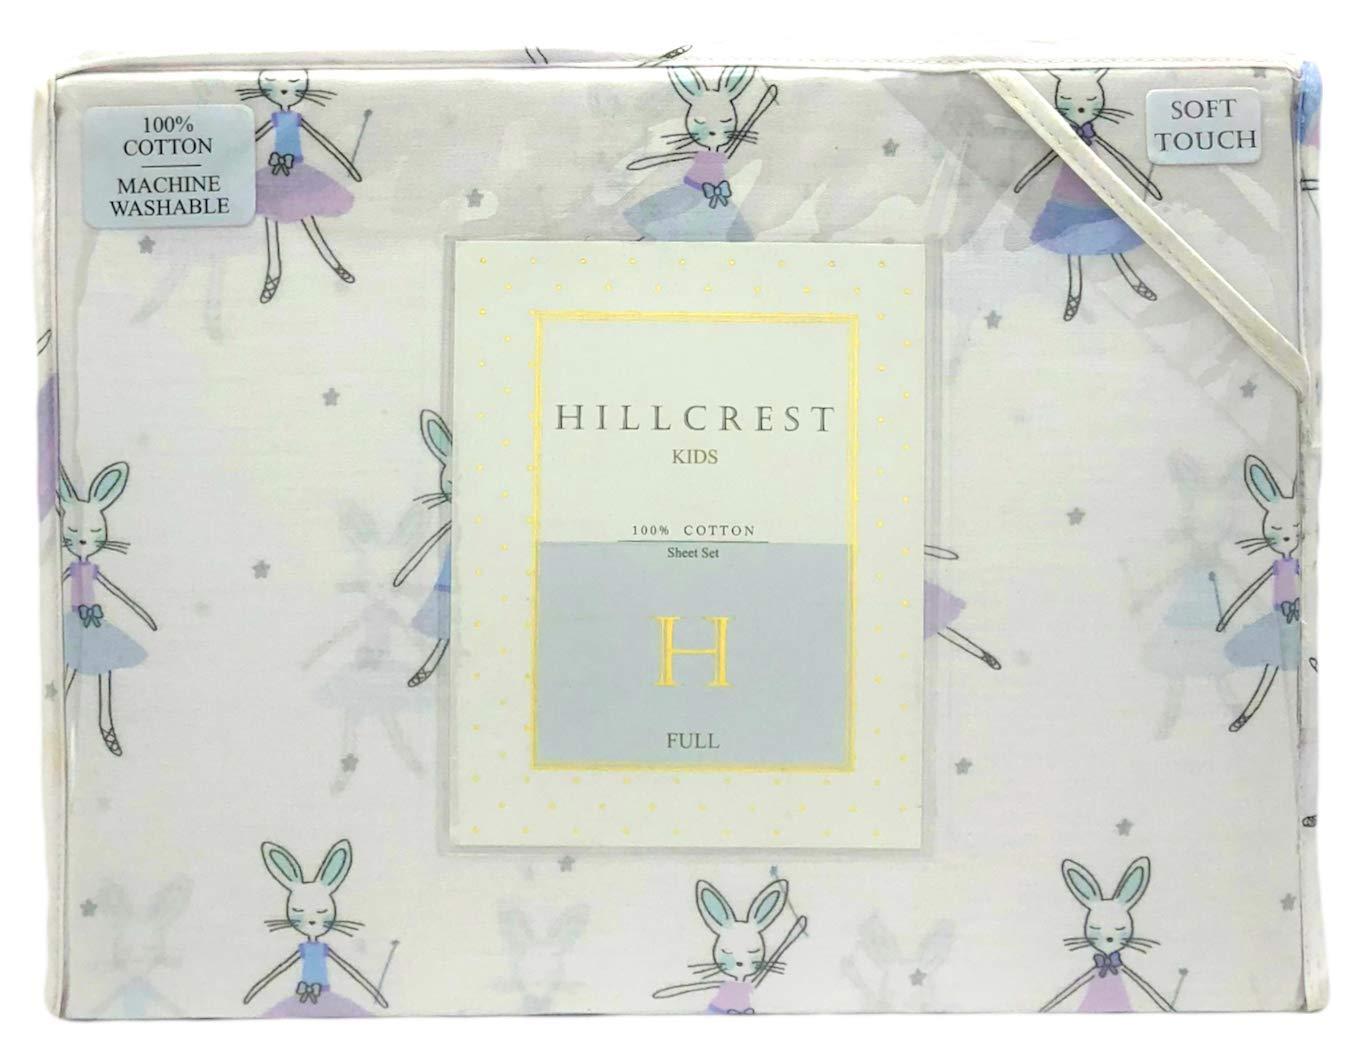 Hillcrest キッズ バレリーナ バニー コットン フルサイズ シーツセット B07GNVL15N